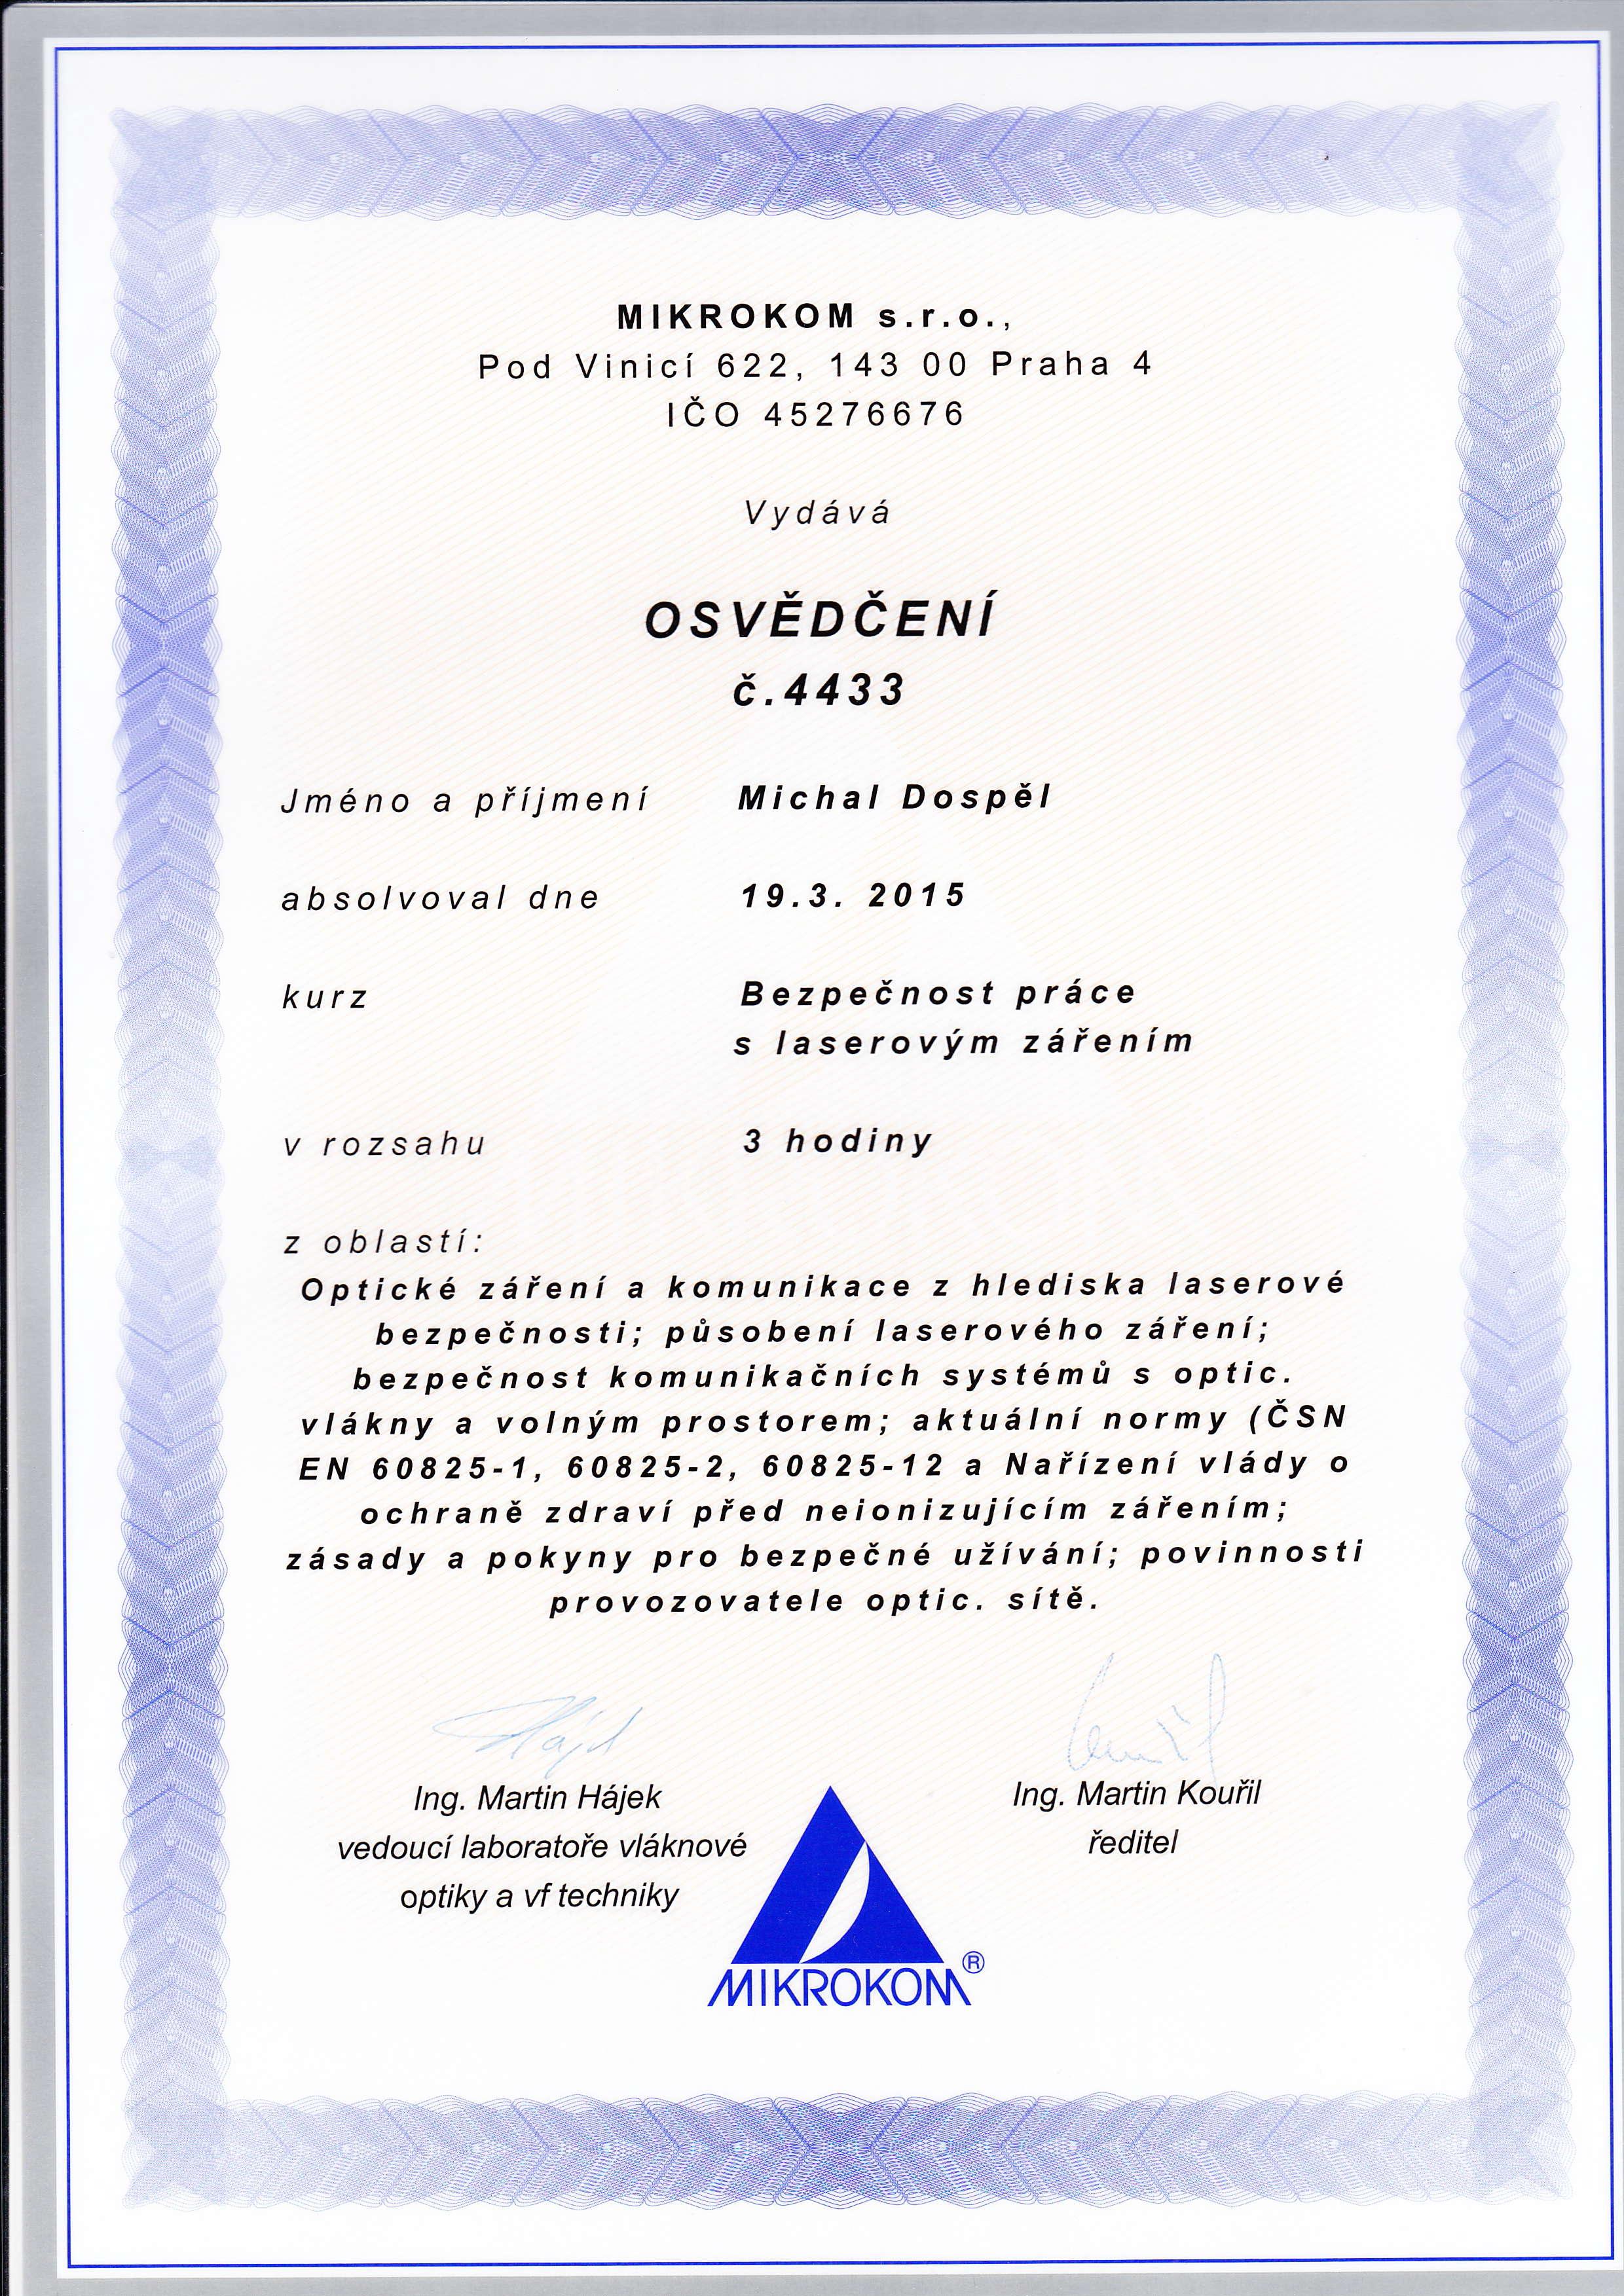 Certifikat Mikrokom laser Michal Dospel